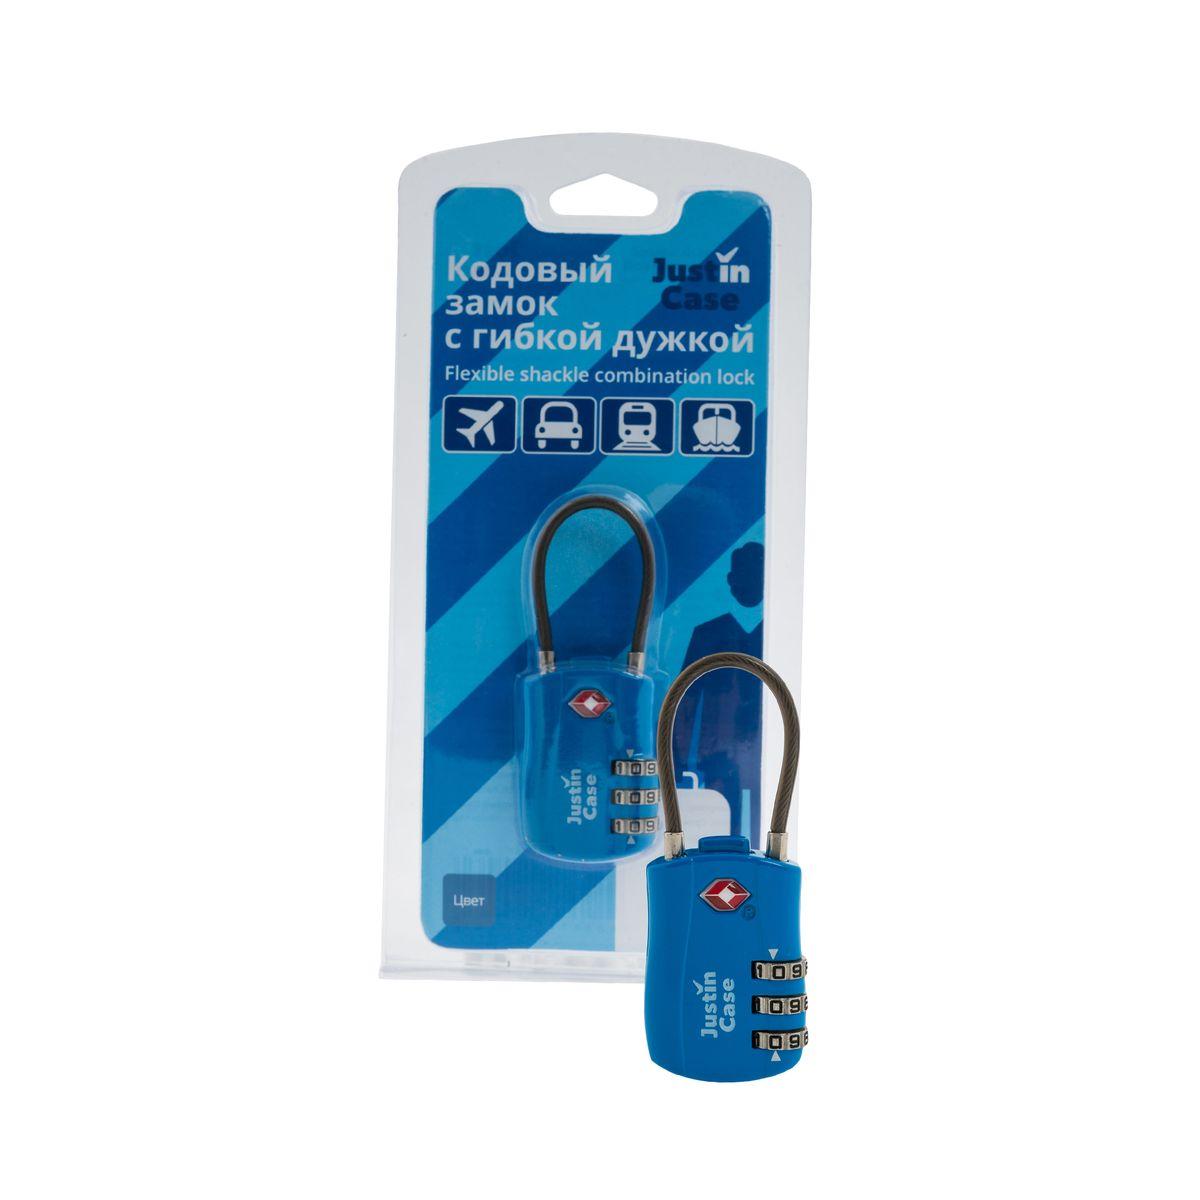 Замок кодовыйс JustinCase  3-Dial Lock TSA , с гибкой дужкой, цвет: голубой - Замки для багажа